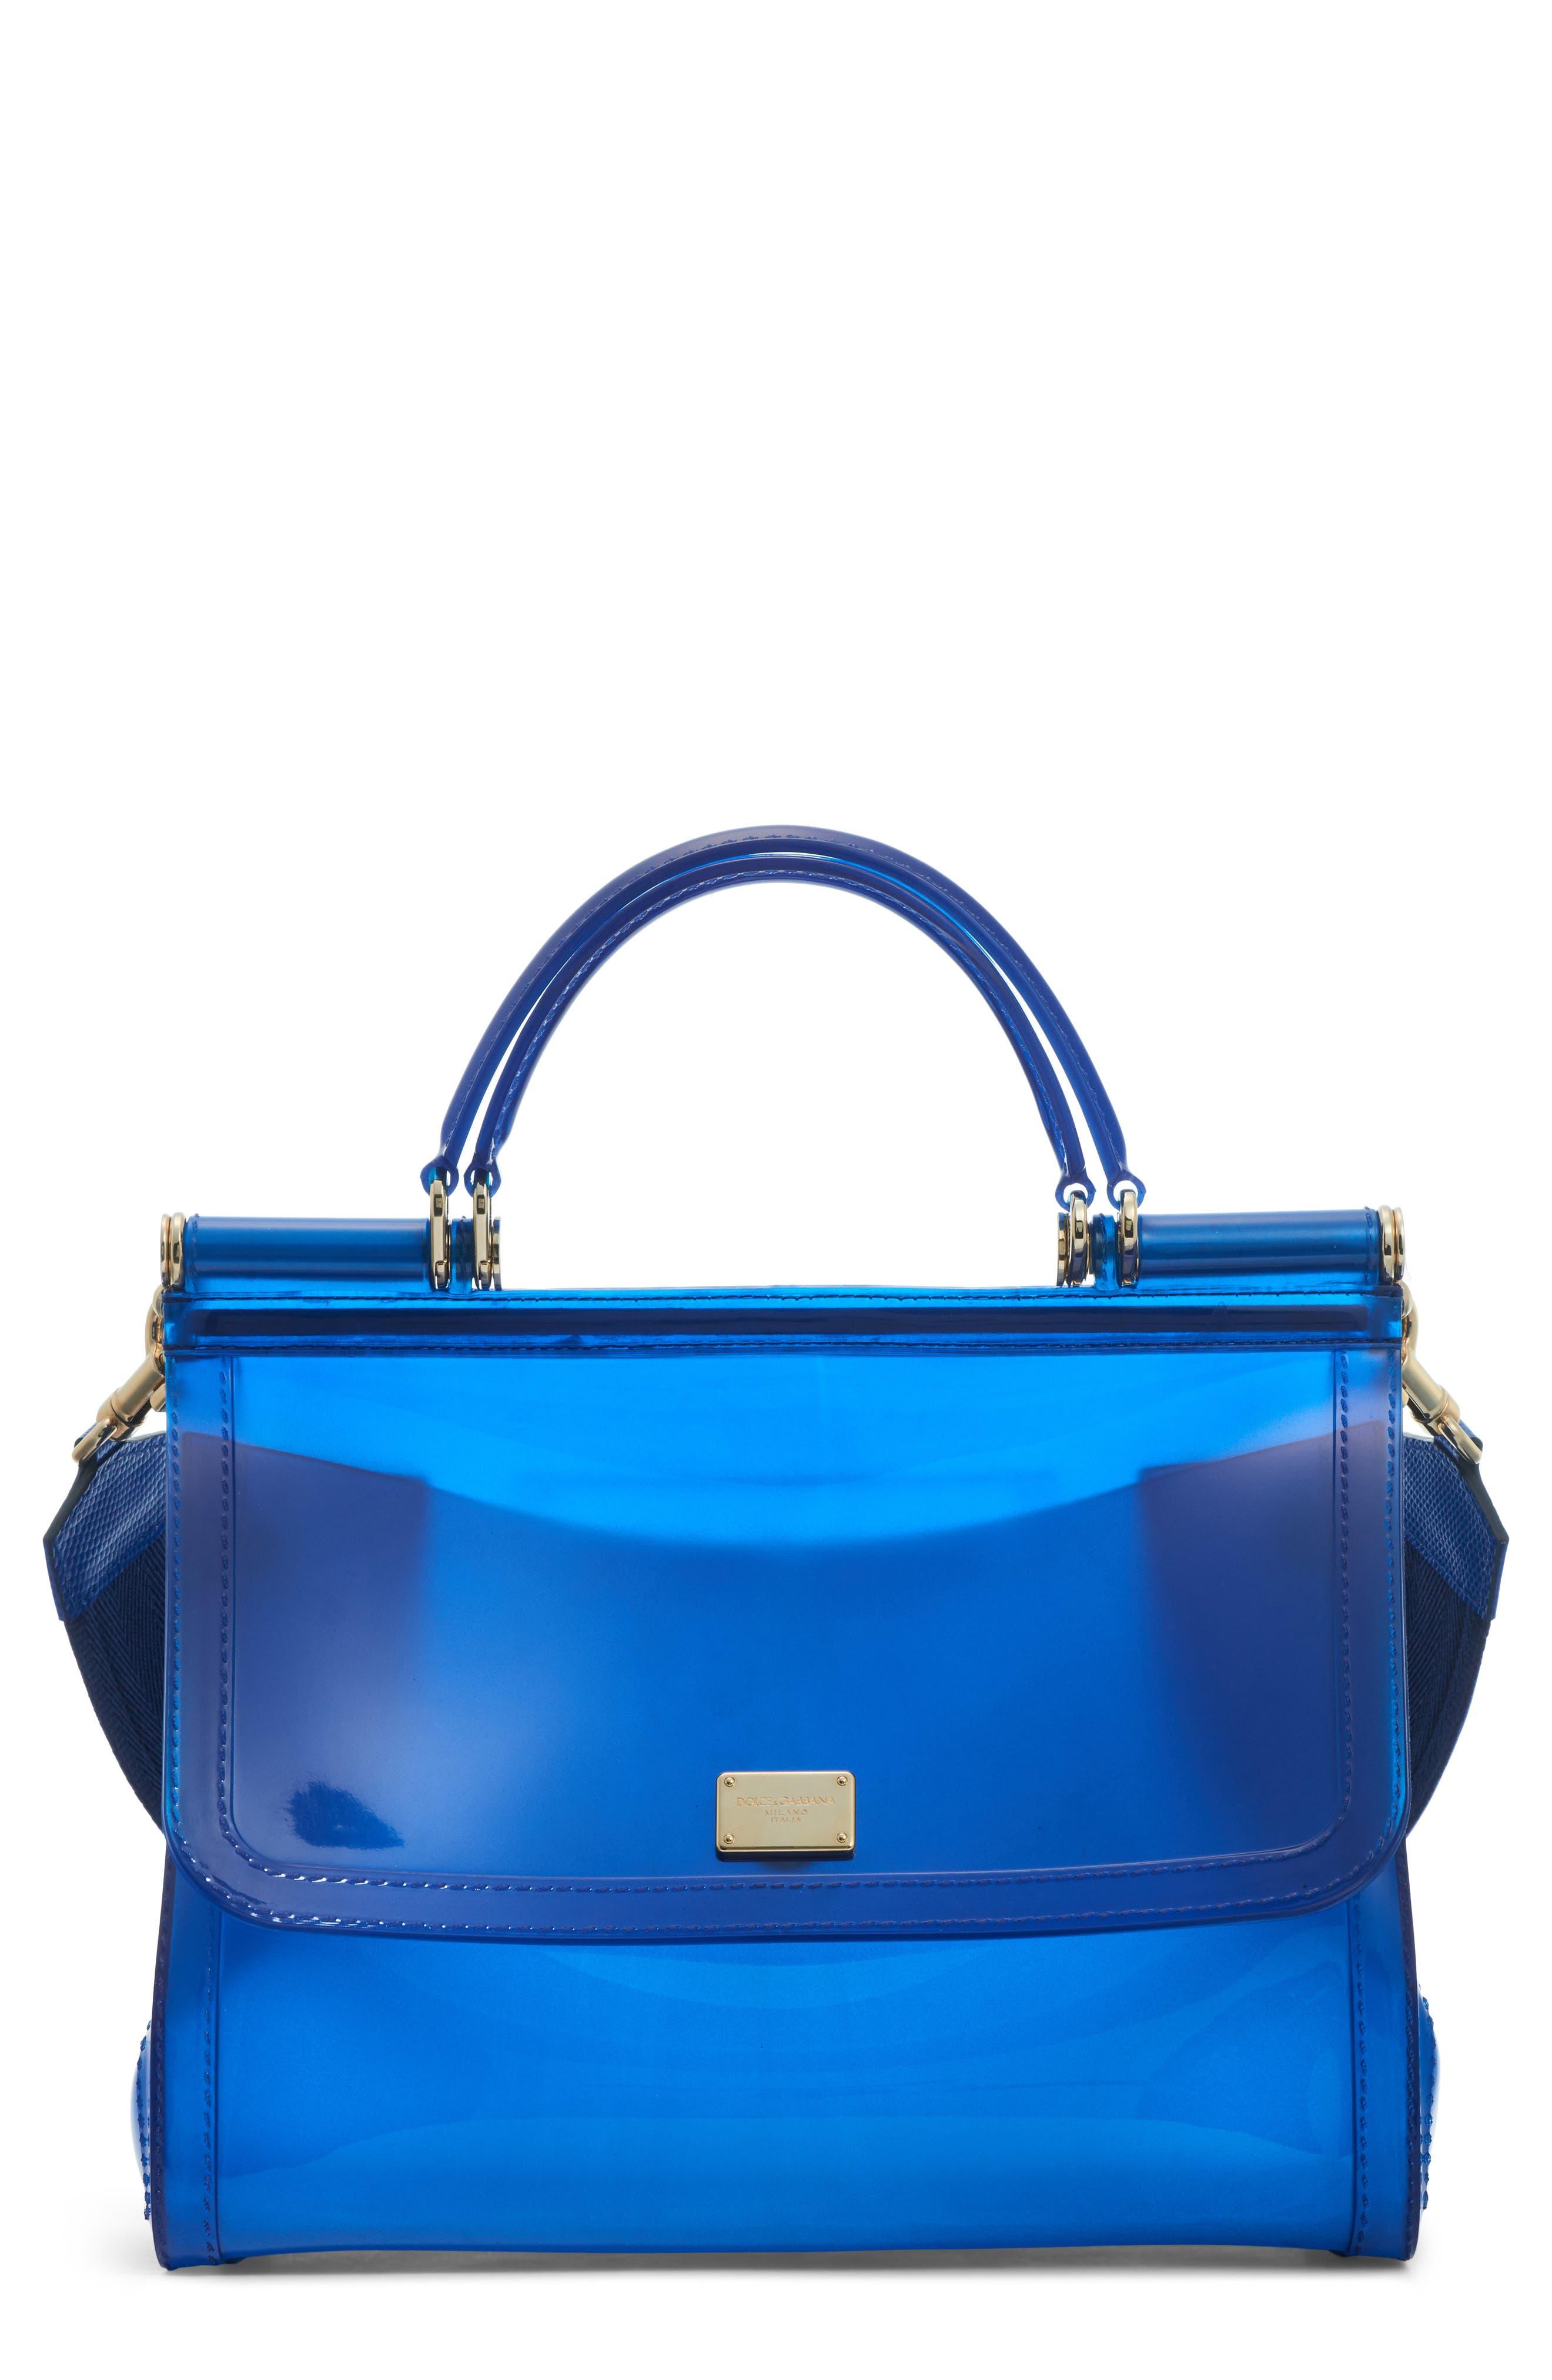 Medium Miss Sicily PVC Satchel,                             Main thumbnail 1, color,                             Blue Multi